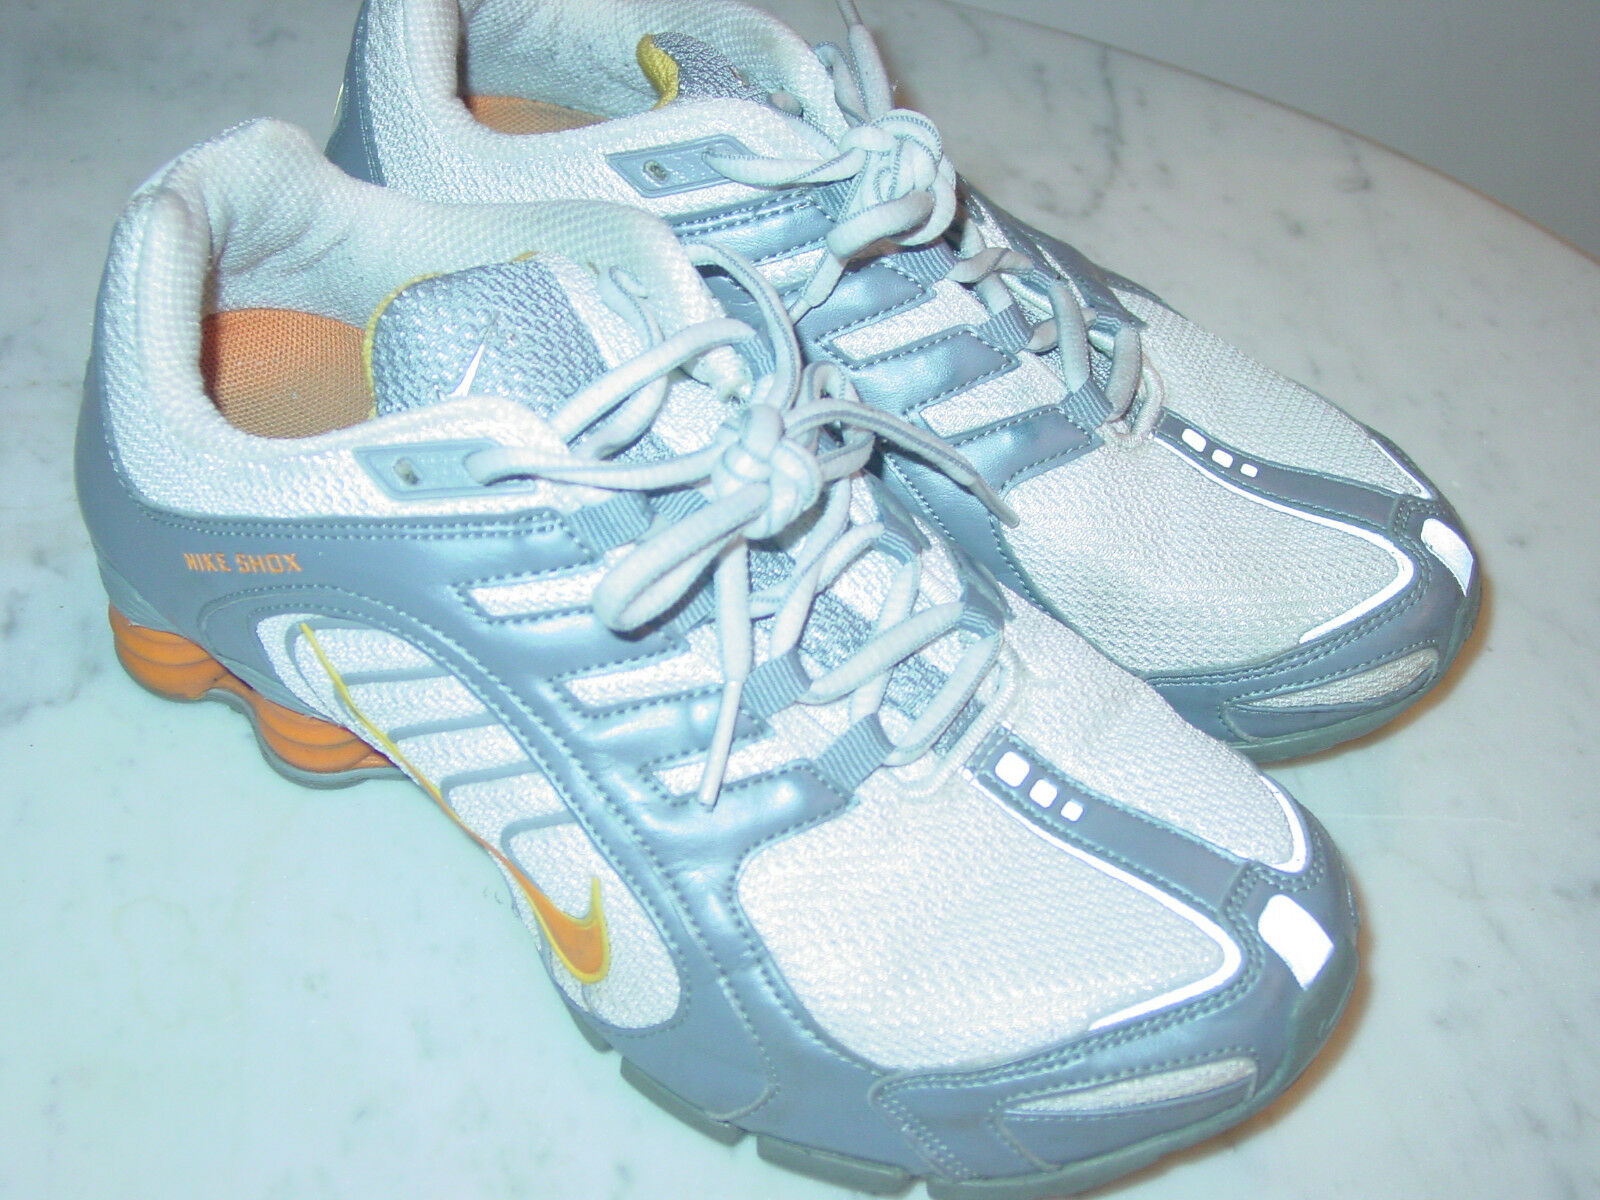 2007 Nike Shox Navina+ White orange Peel Stealth Running shoes Size 7  160.00